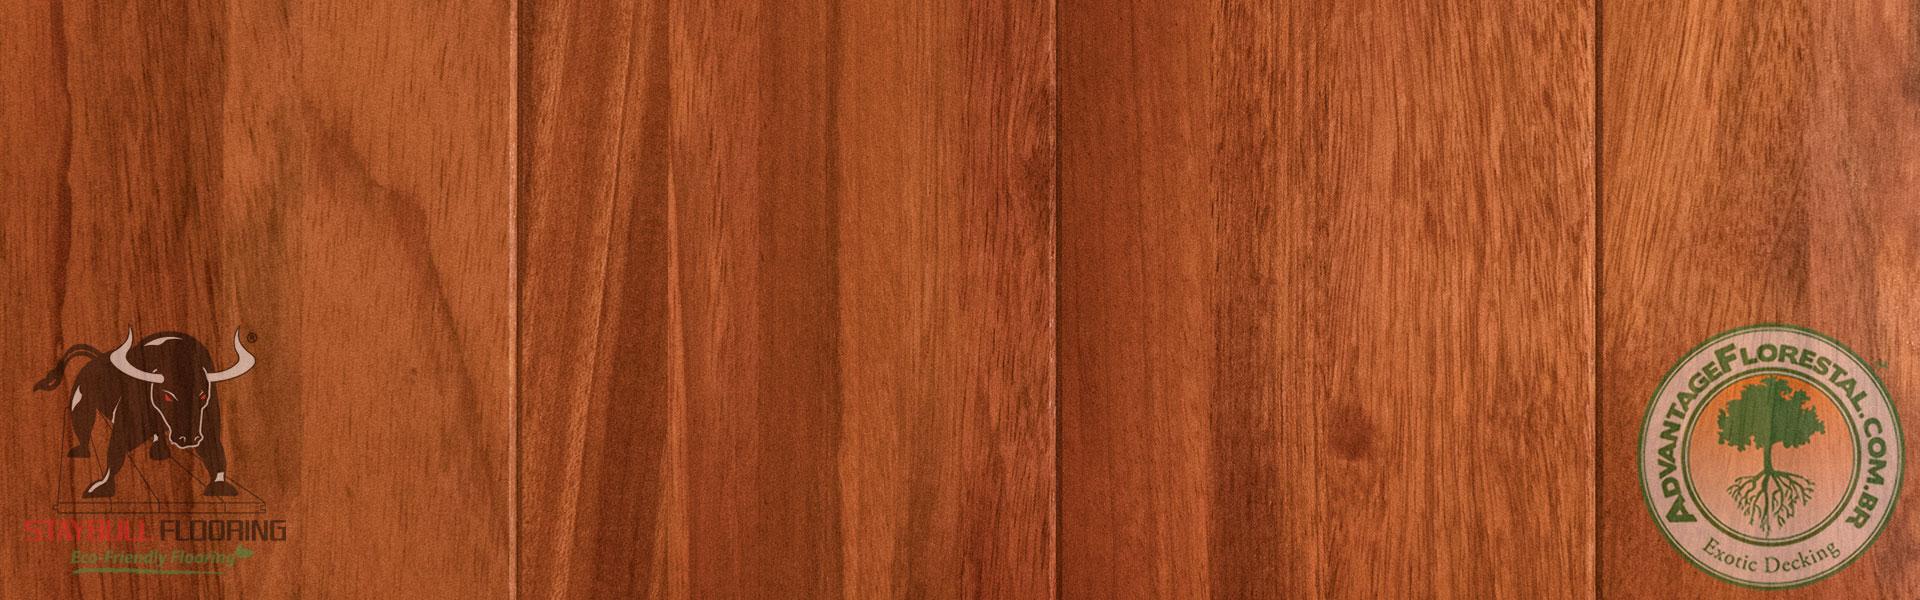 Staybull Brazilian Cherry eco-friendly exotic hardwood flooring